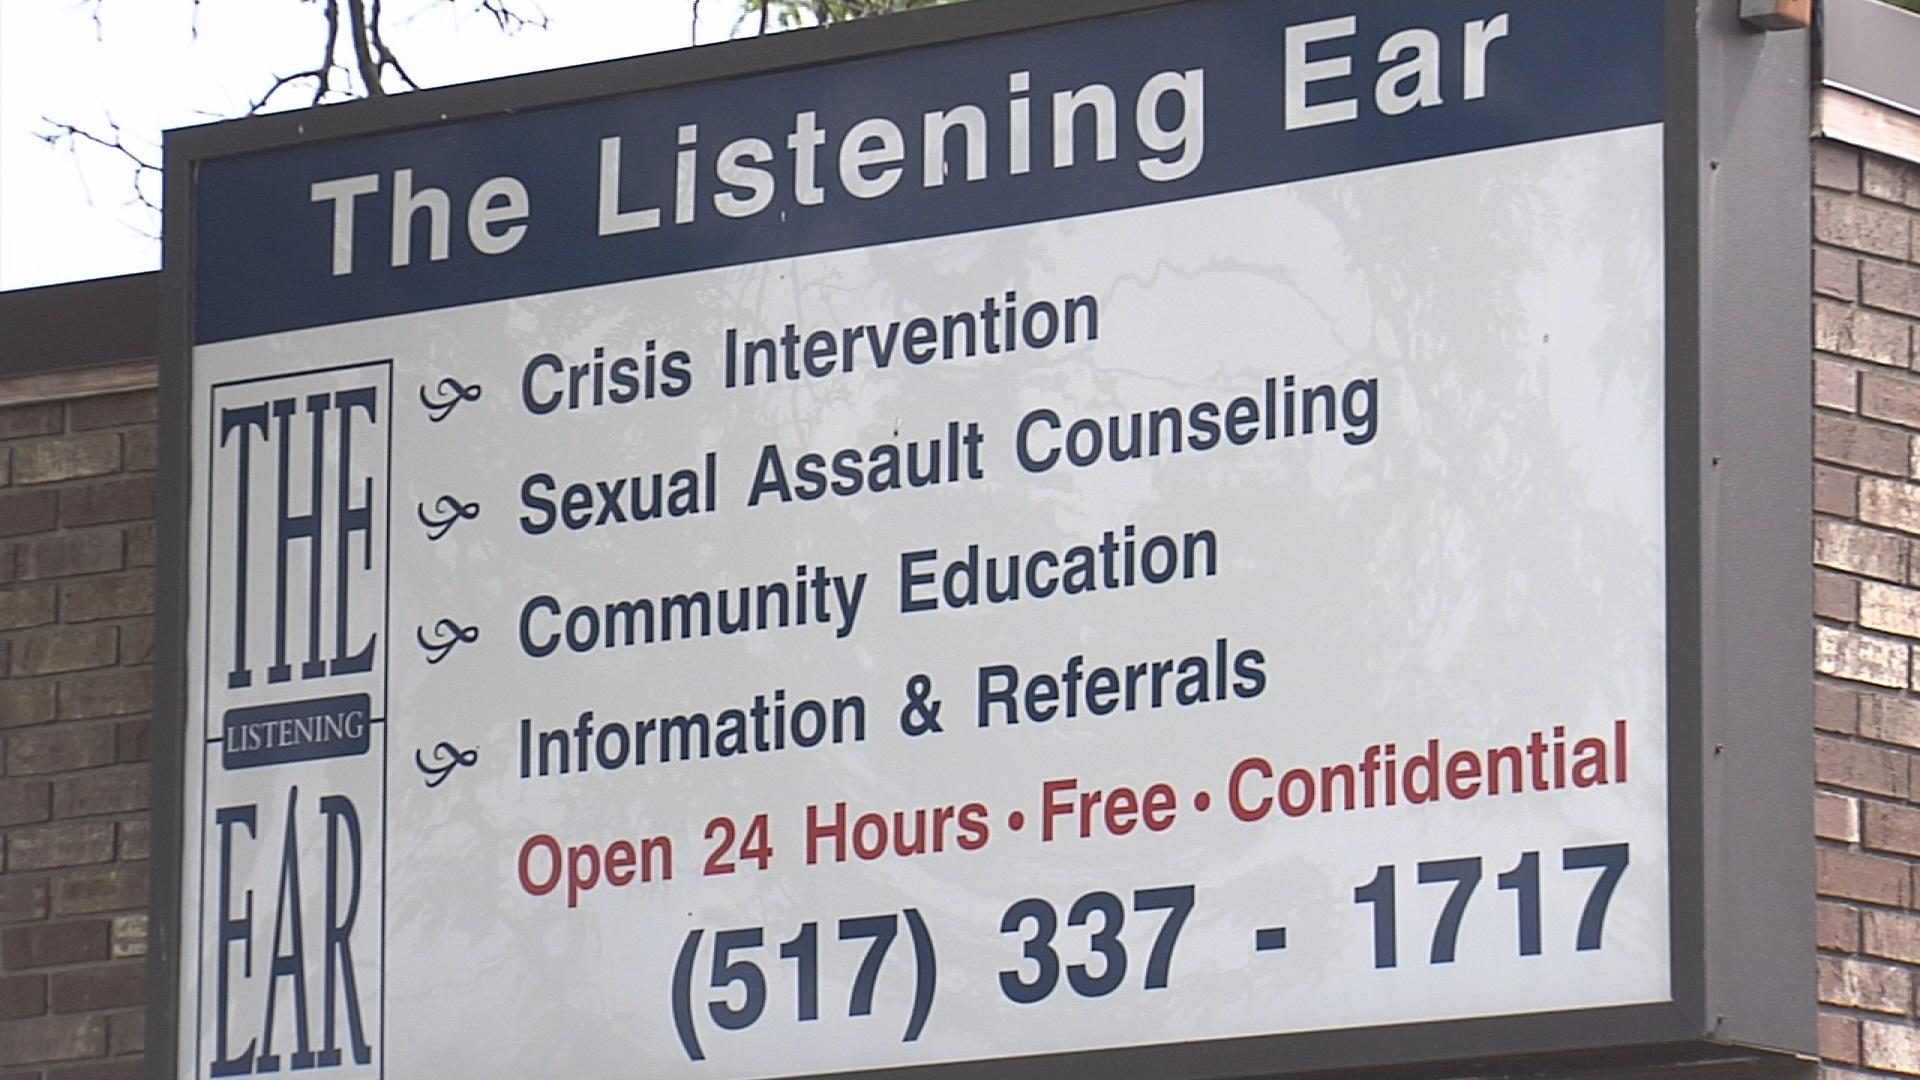 Listening Ear_161607